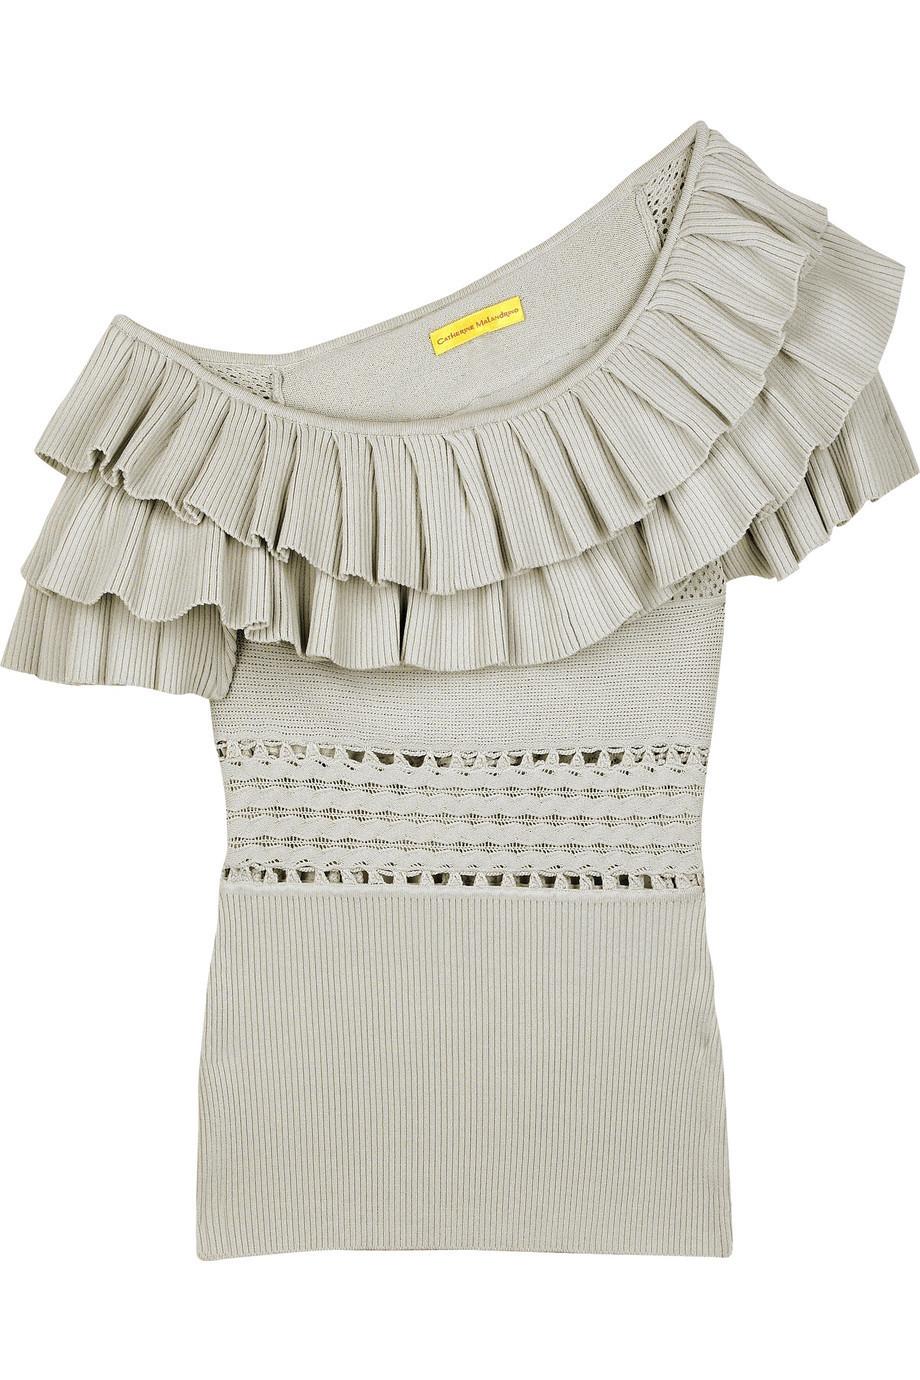 Catherine Malandrino Ruffle neck top|NET-A-PORTER.COM